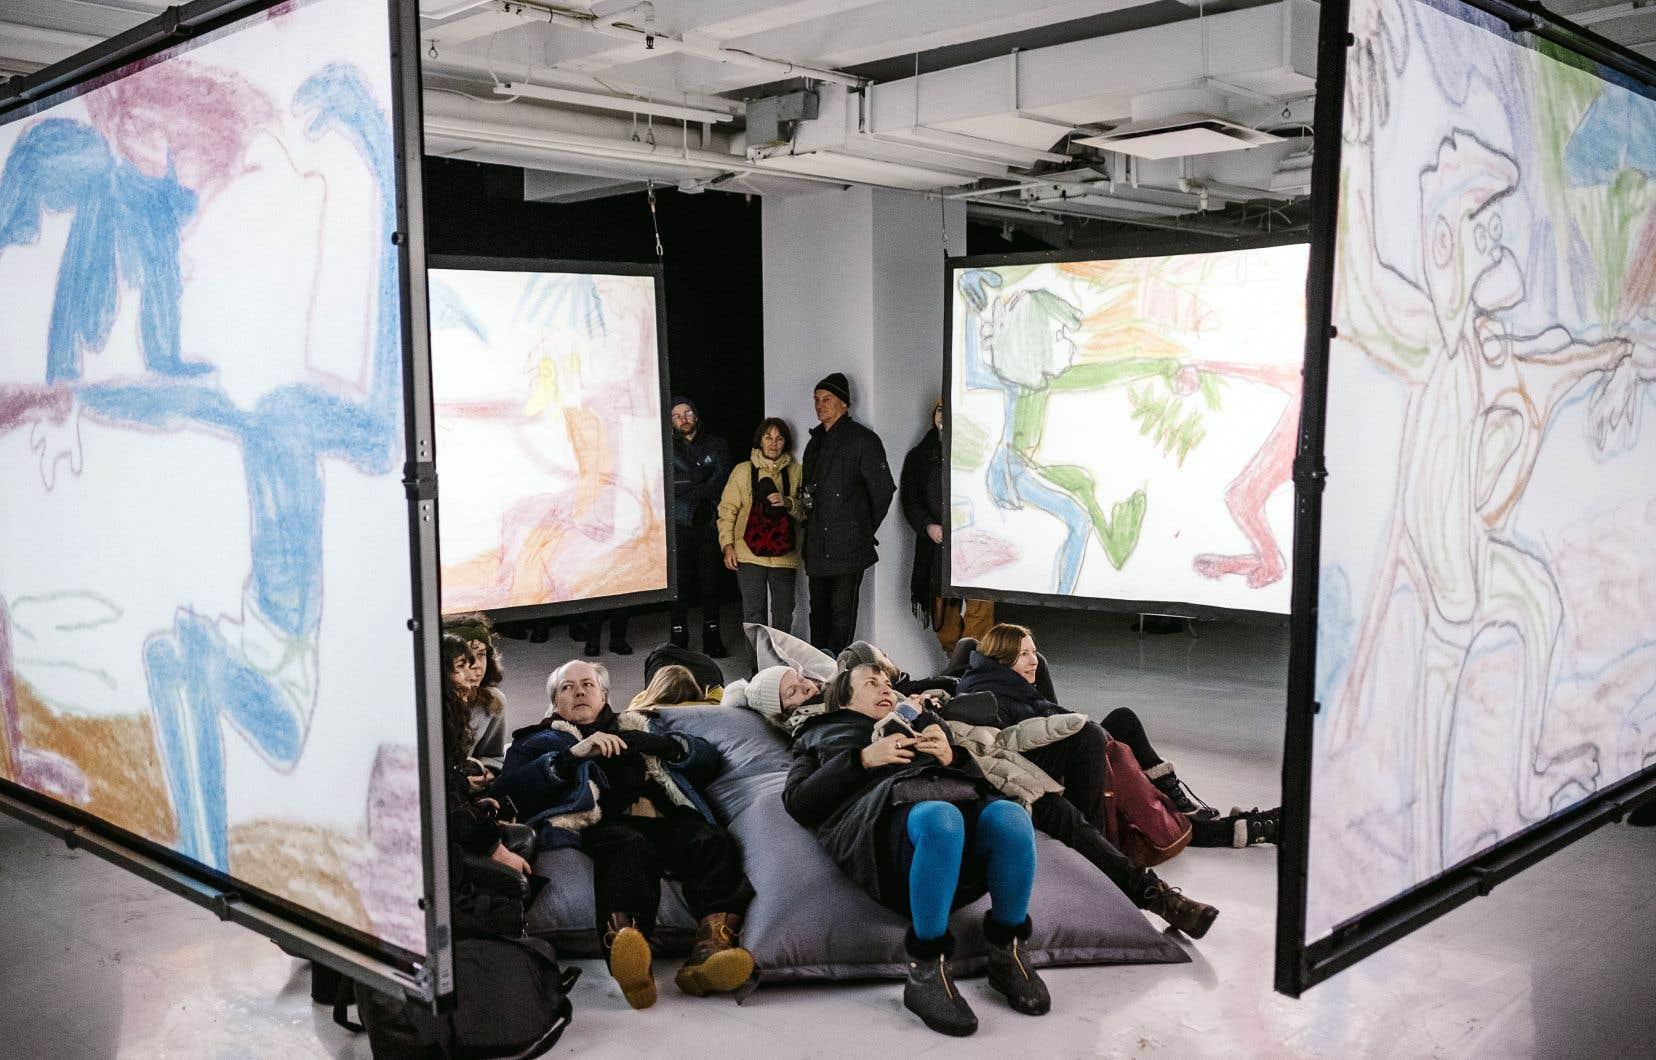 Vue de l'installation «Reanimation (Baloo Stripped Bare)» d'Oliver Beer à la Galerie des arts visuels, à Québec.